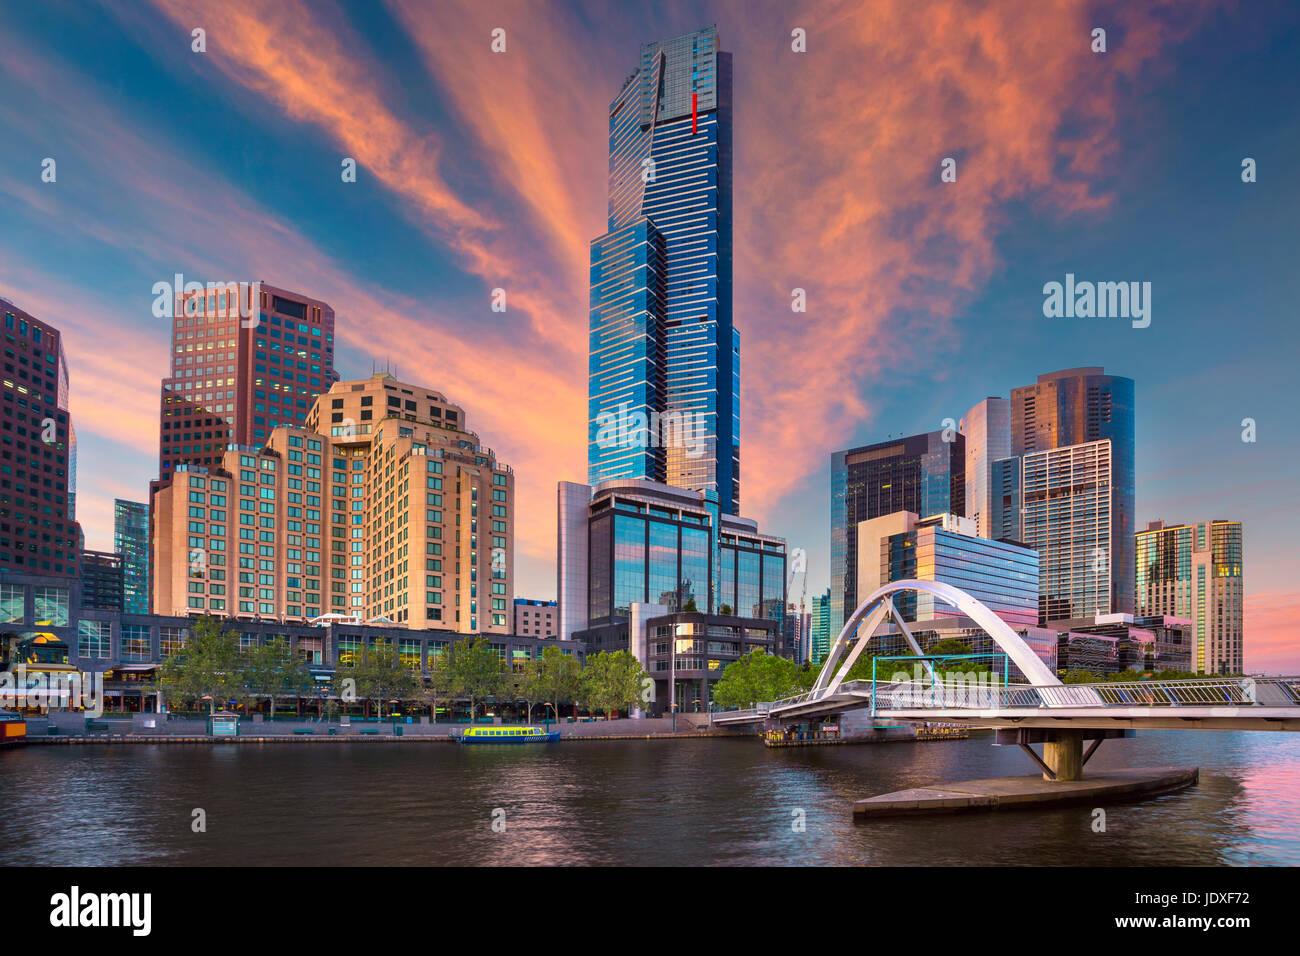 City of Melbourne. Cityscape image of Melbourne, Australia during summer sunrise. - Stock Image